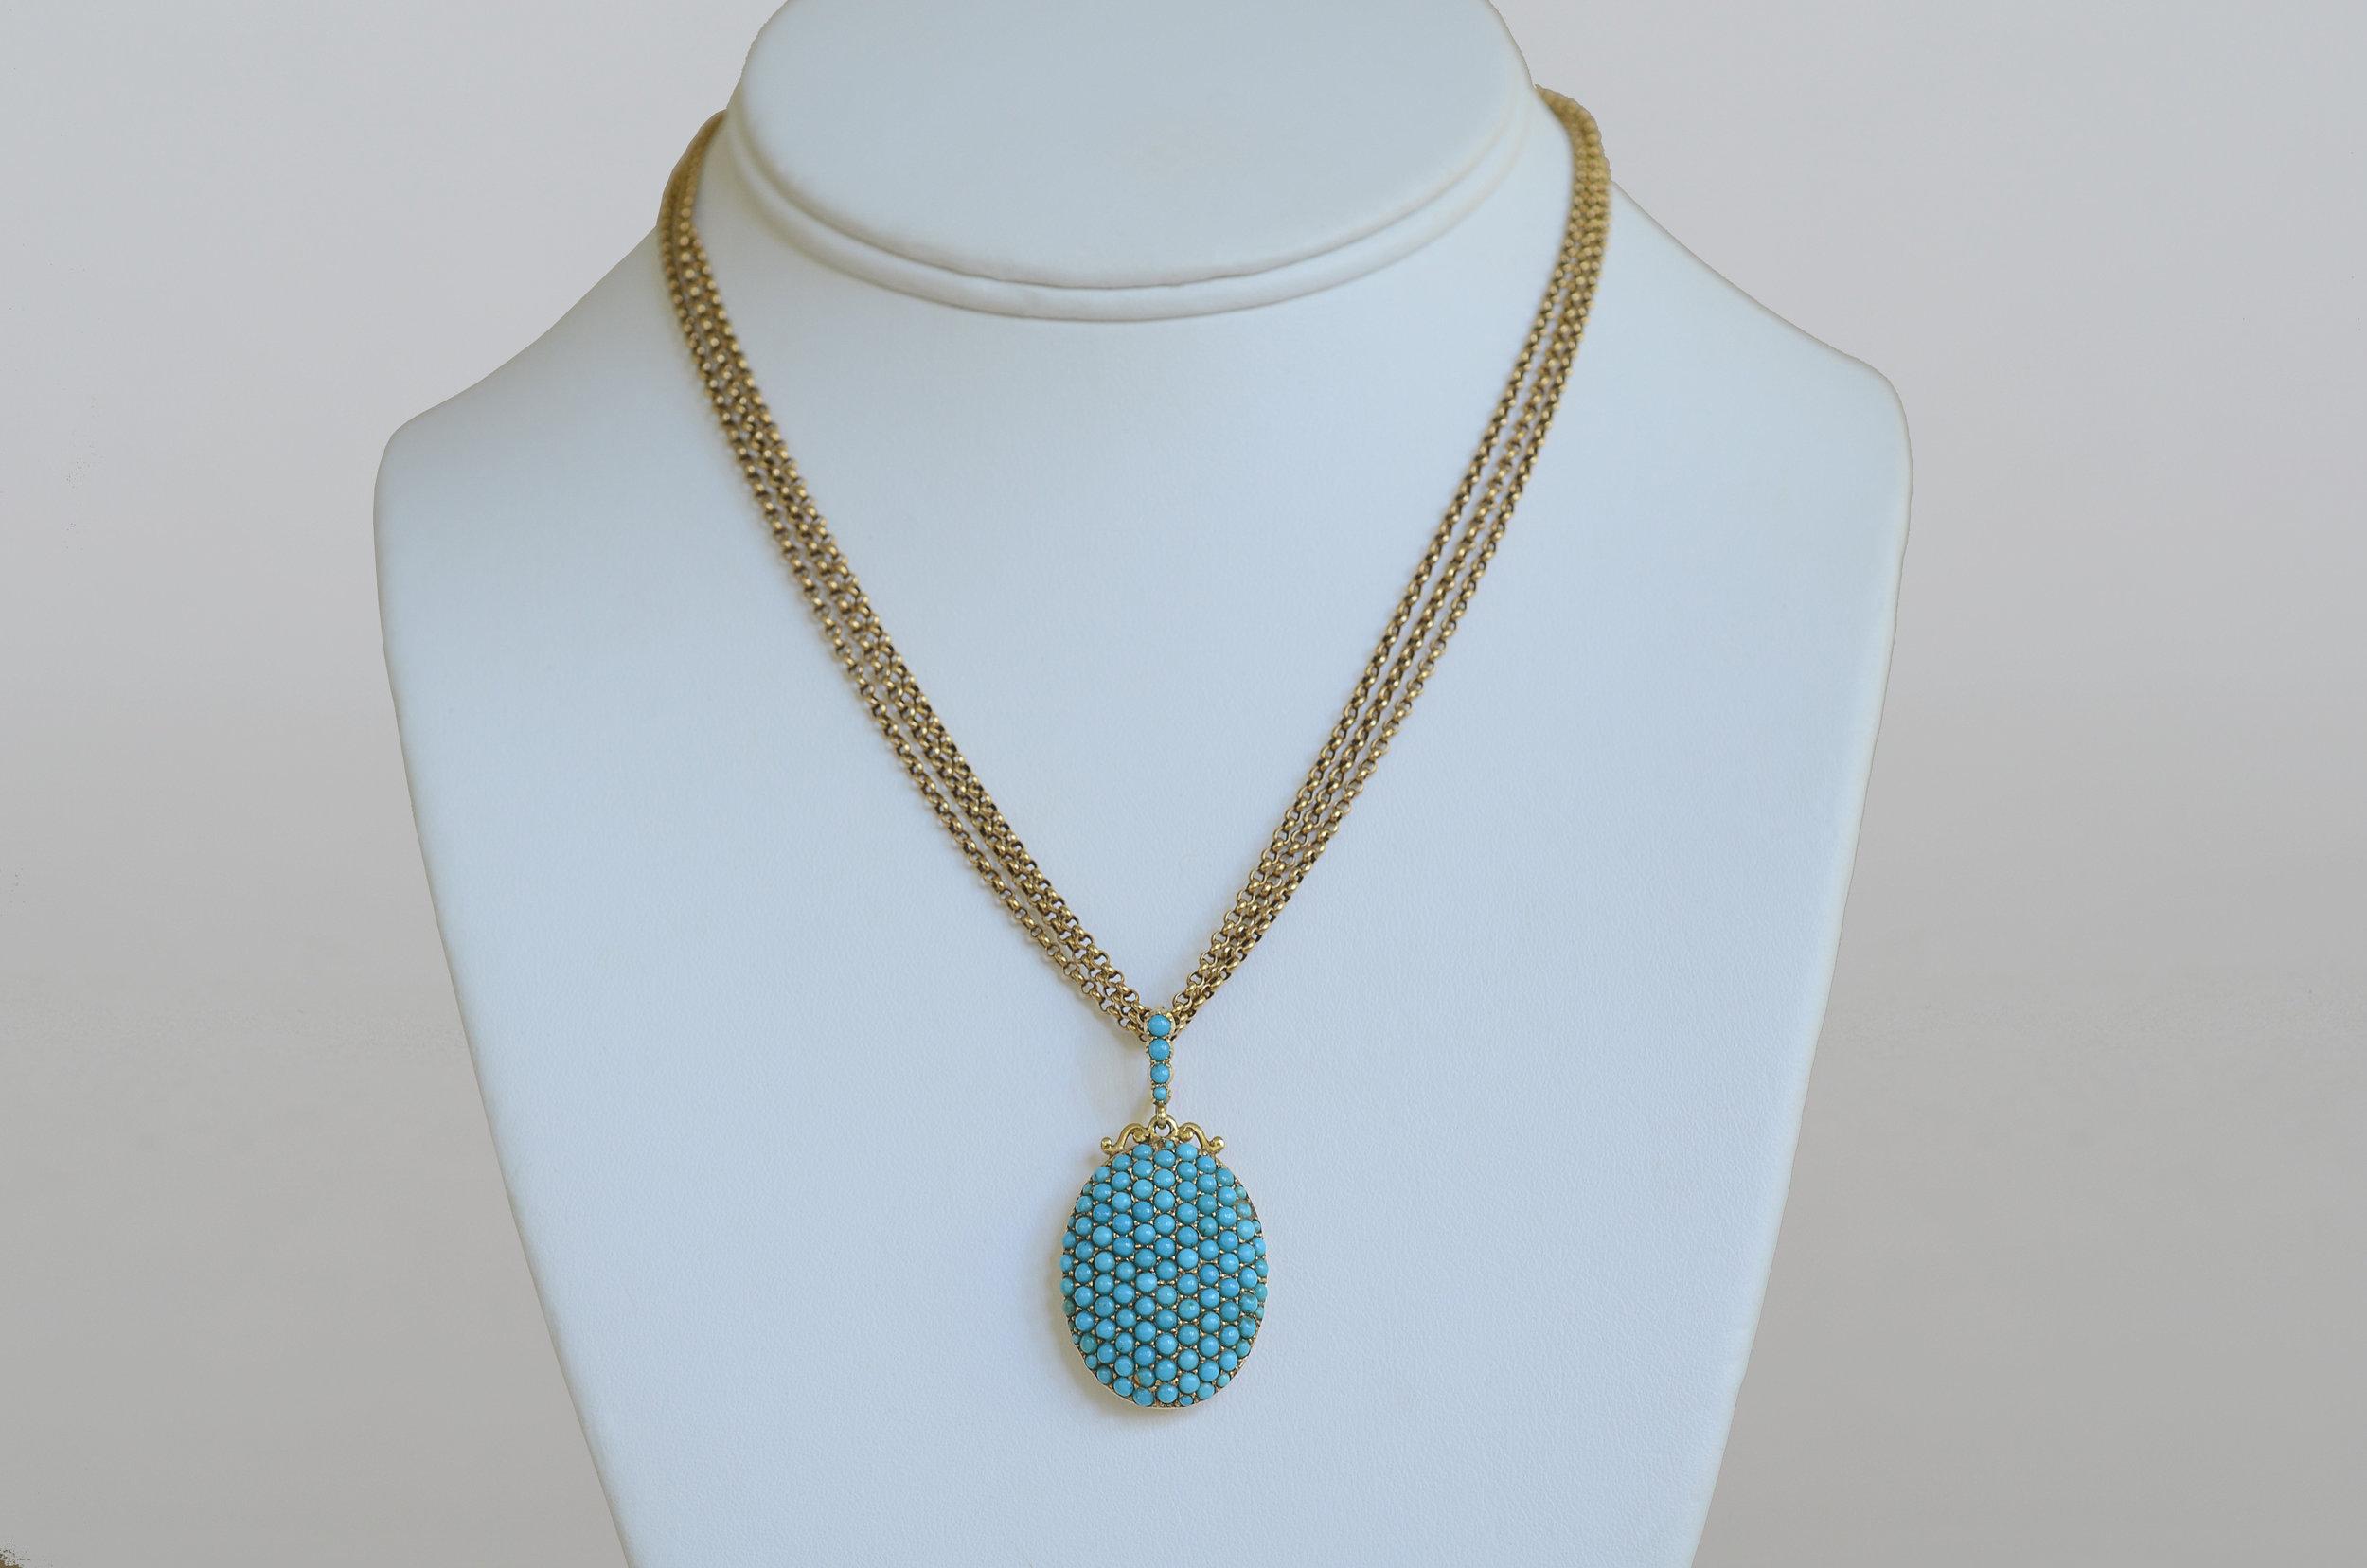 Turquoise Pendant Necklace.2.jpg